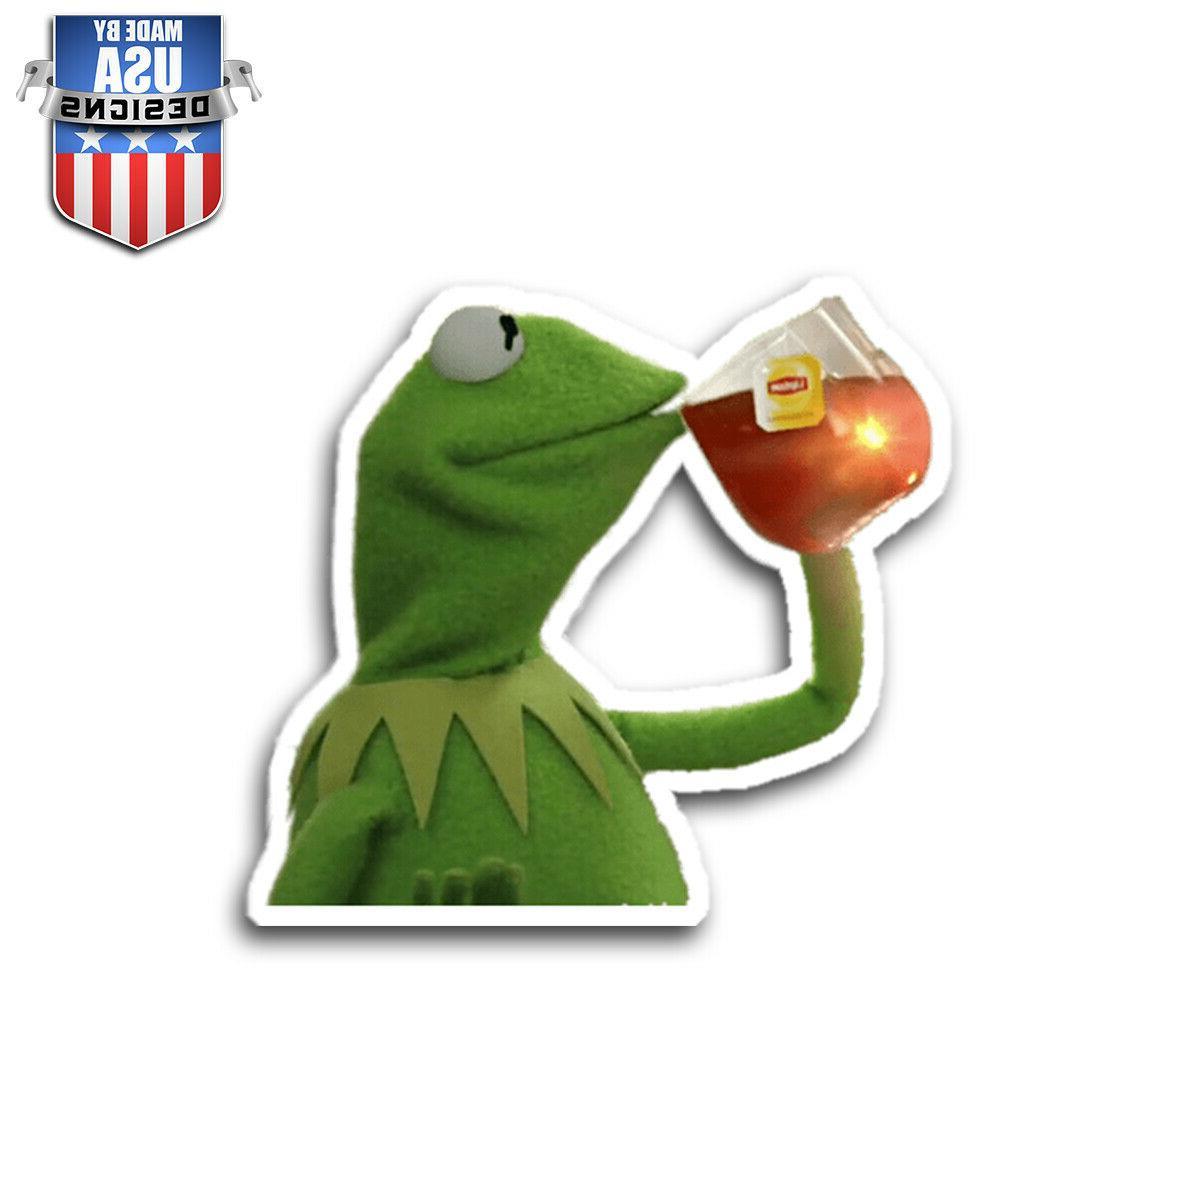 kermit tea meme sticker decal phone laptop